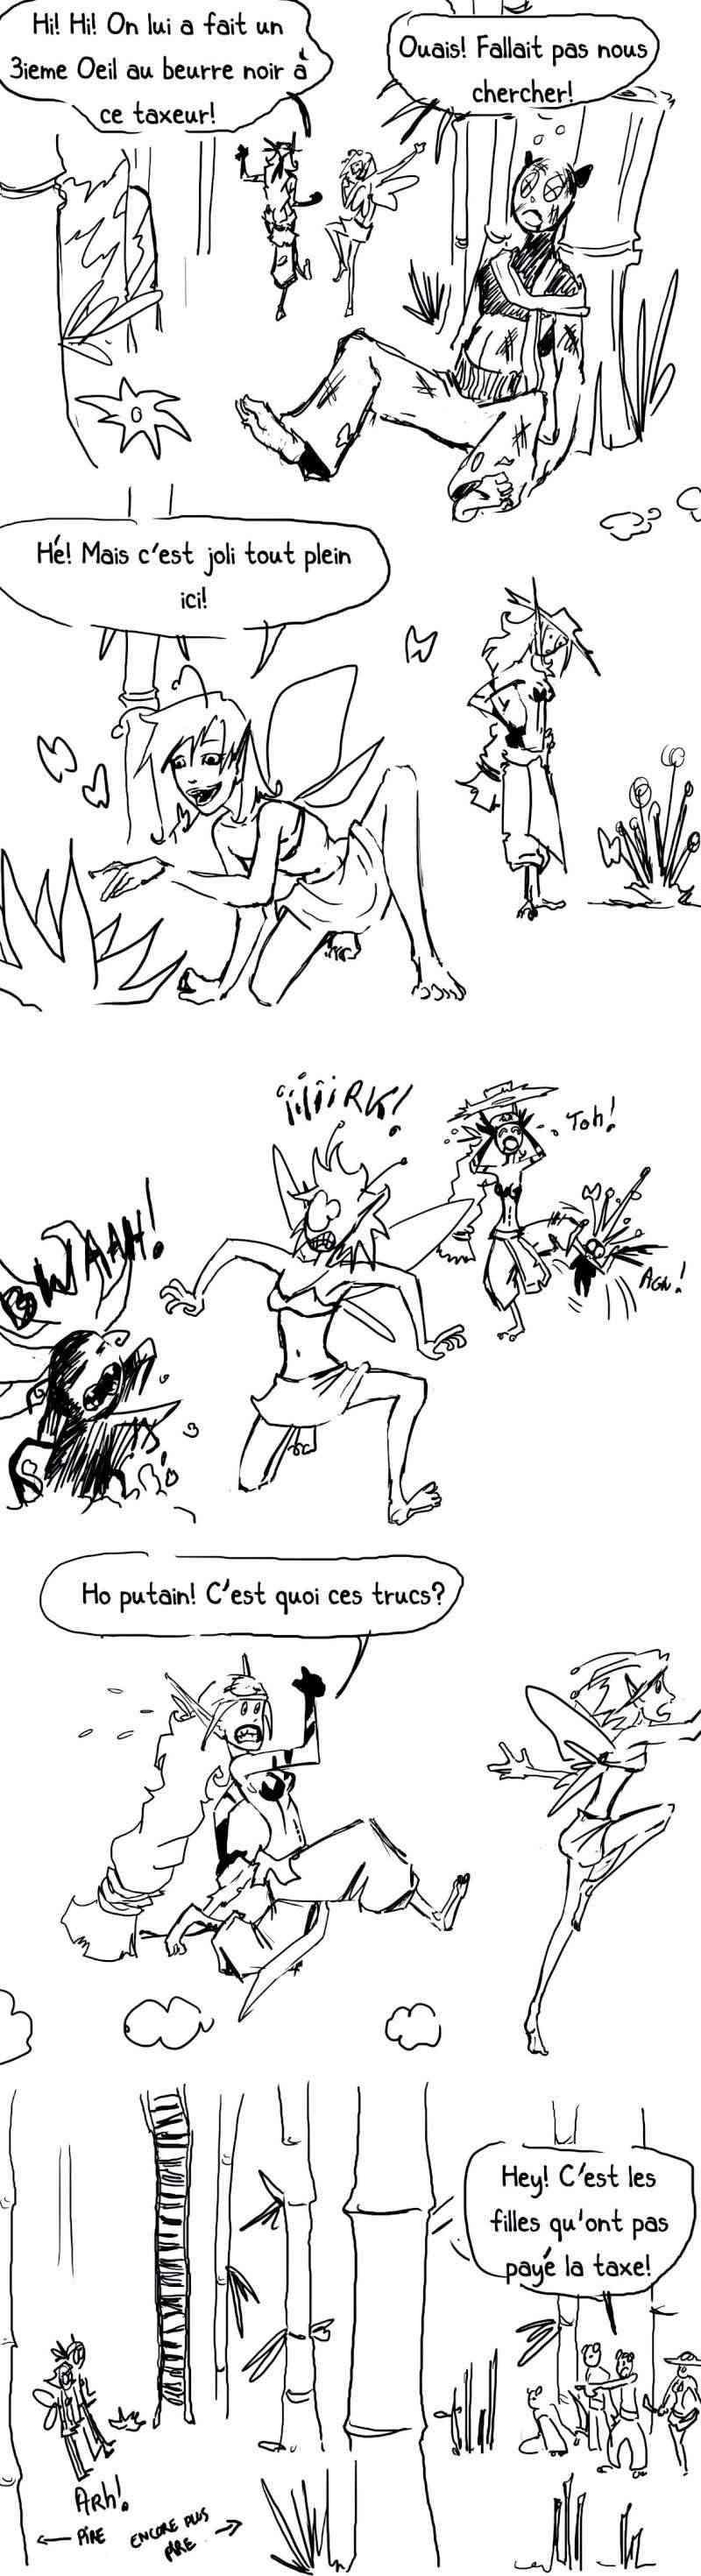 seik et ekis, les aventures ILLUSTREES - Page 2 Strip314